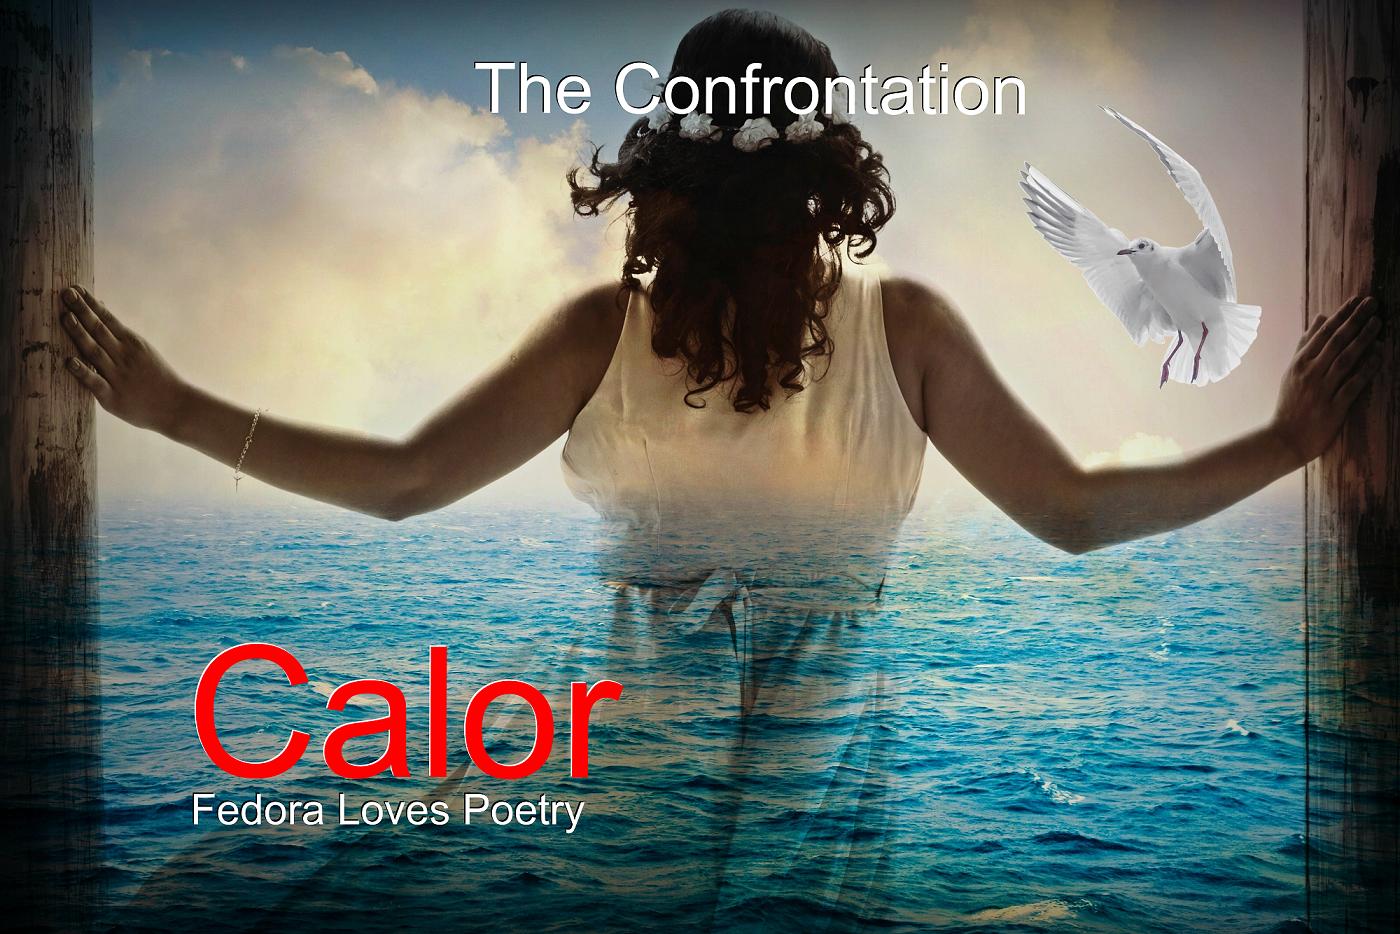 Calor - The Confrontation by Fedora